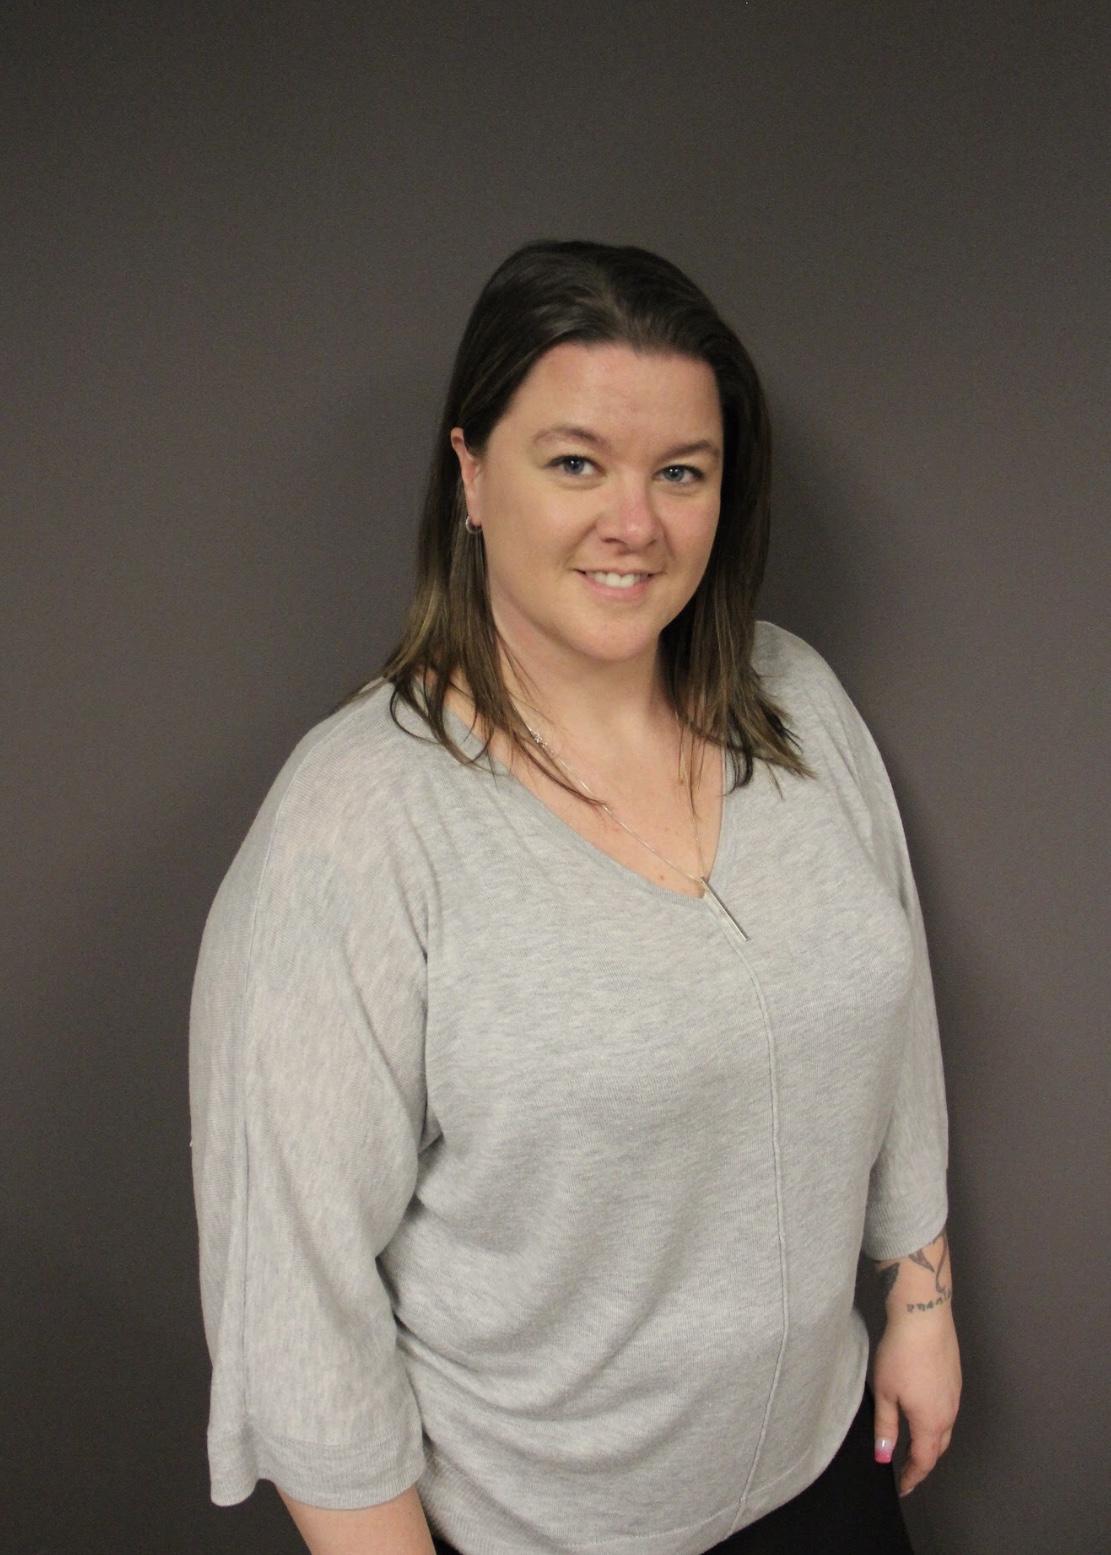 Krystie Vohnoutka - Commercial Lines Account ManagerKristine@MnAgent.com